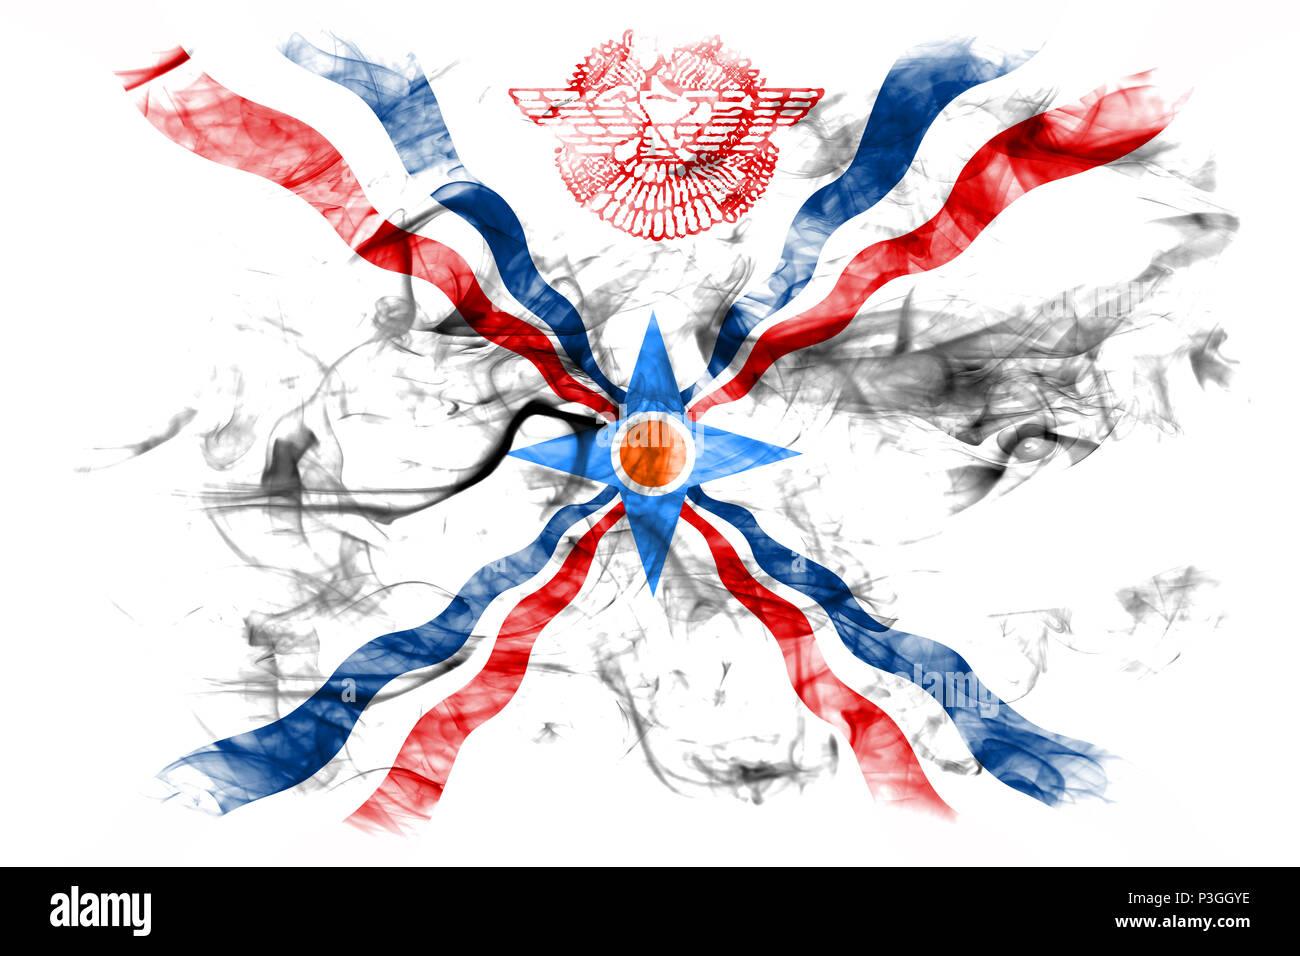 Assyria smoke flag, dependent territory flag - Stock Image